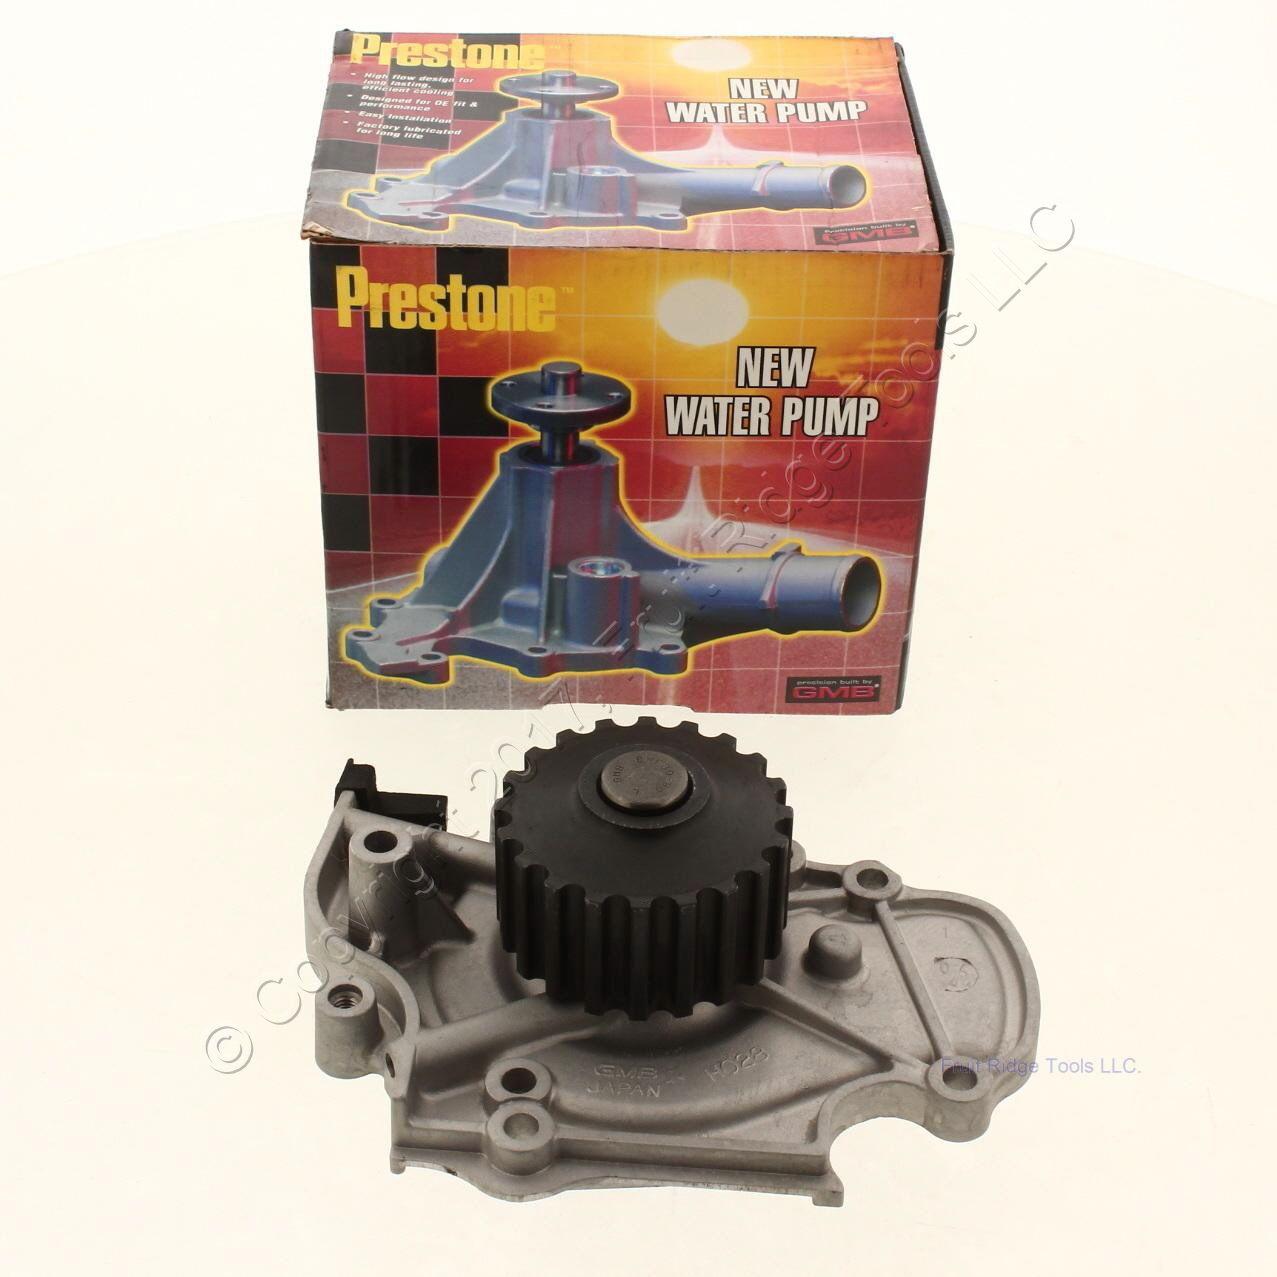 New Prestone by GMB Water Pump 135-1390 for 97-00 EL 96-00 Civic